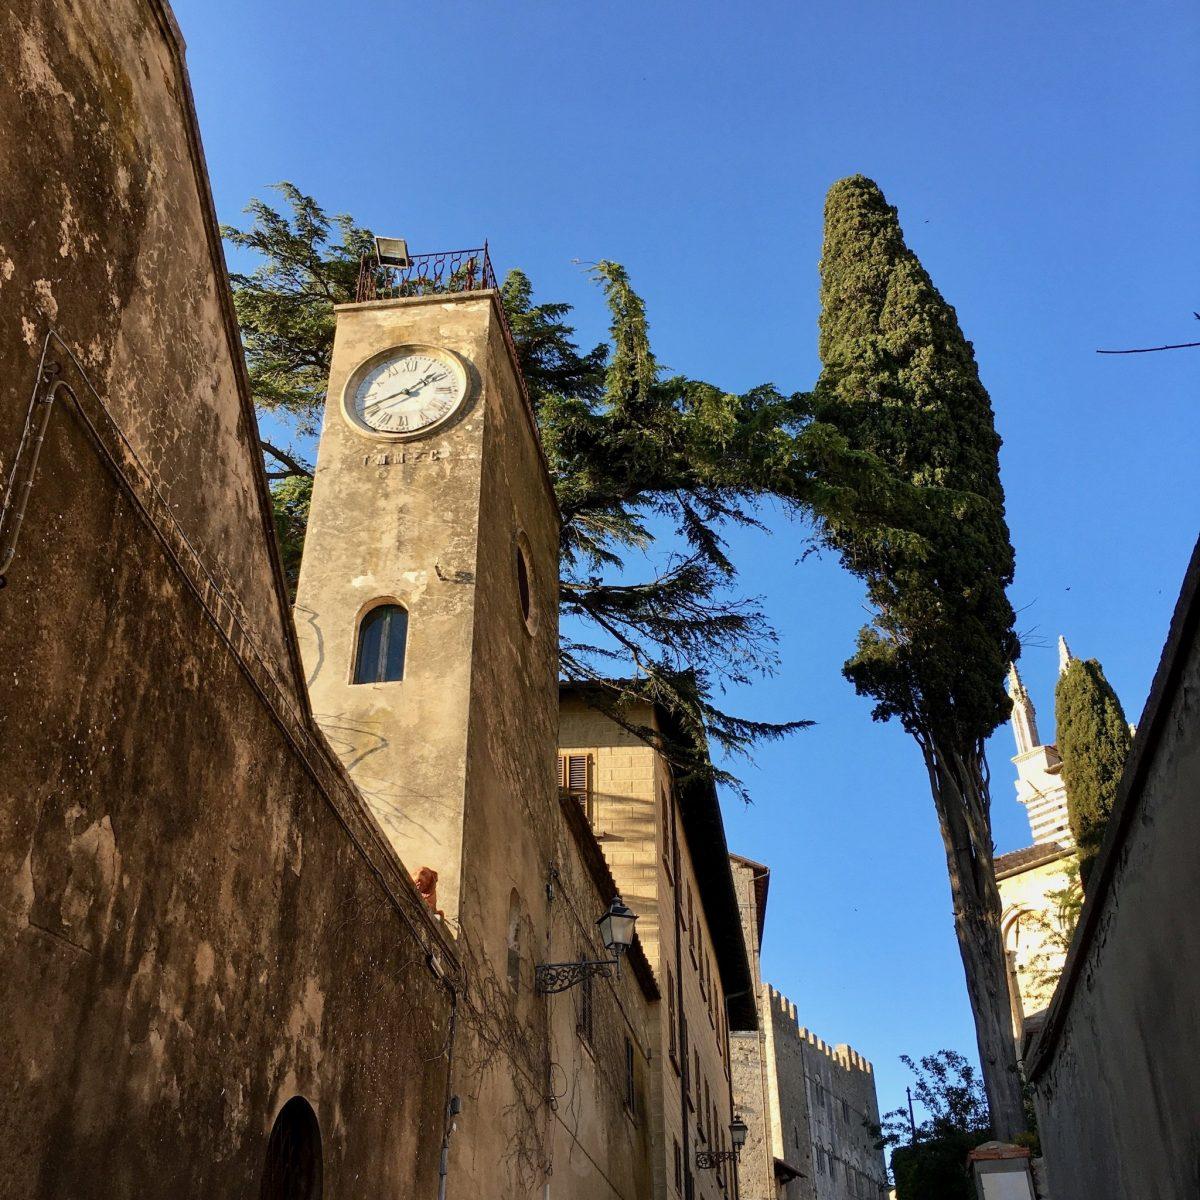 Uhr an altem Gebäude Massa Marittima